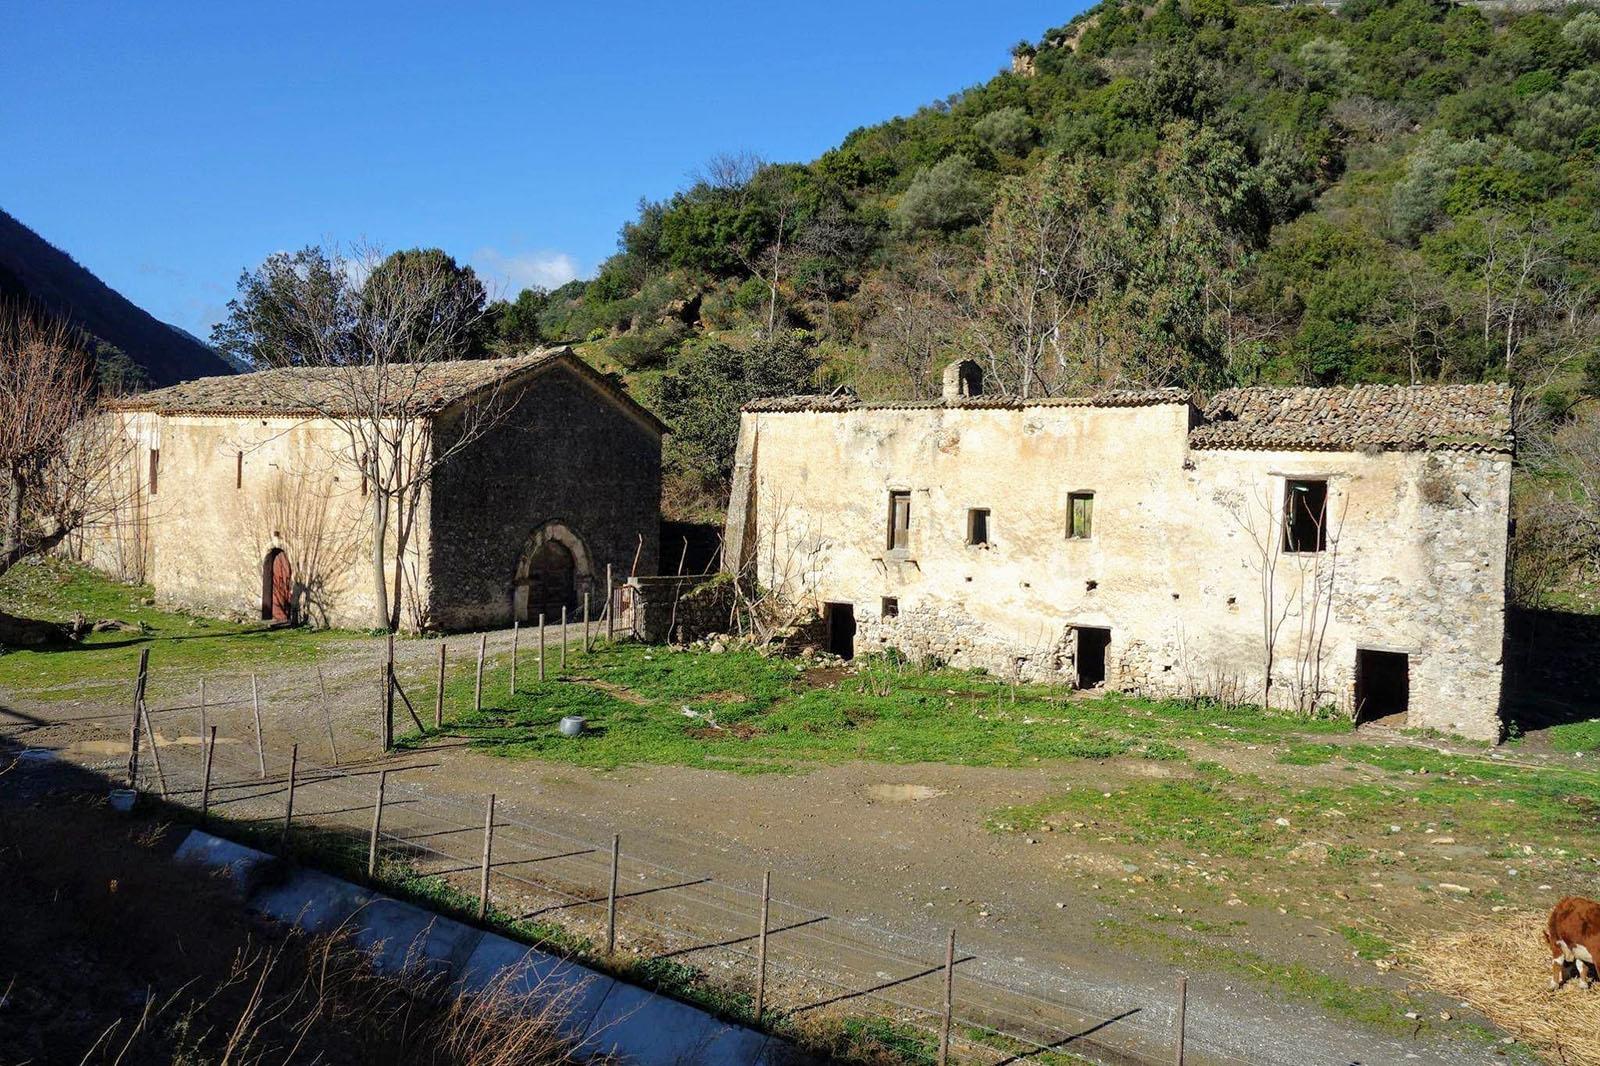 Longobucco: Santa Maria della Mercede